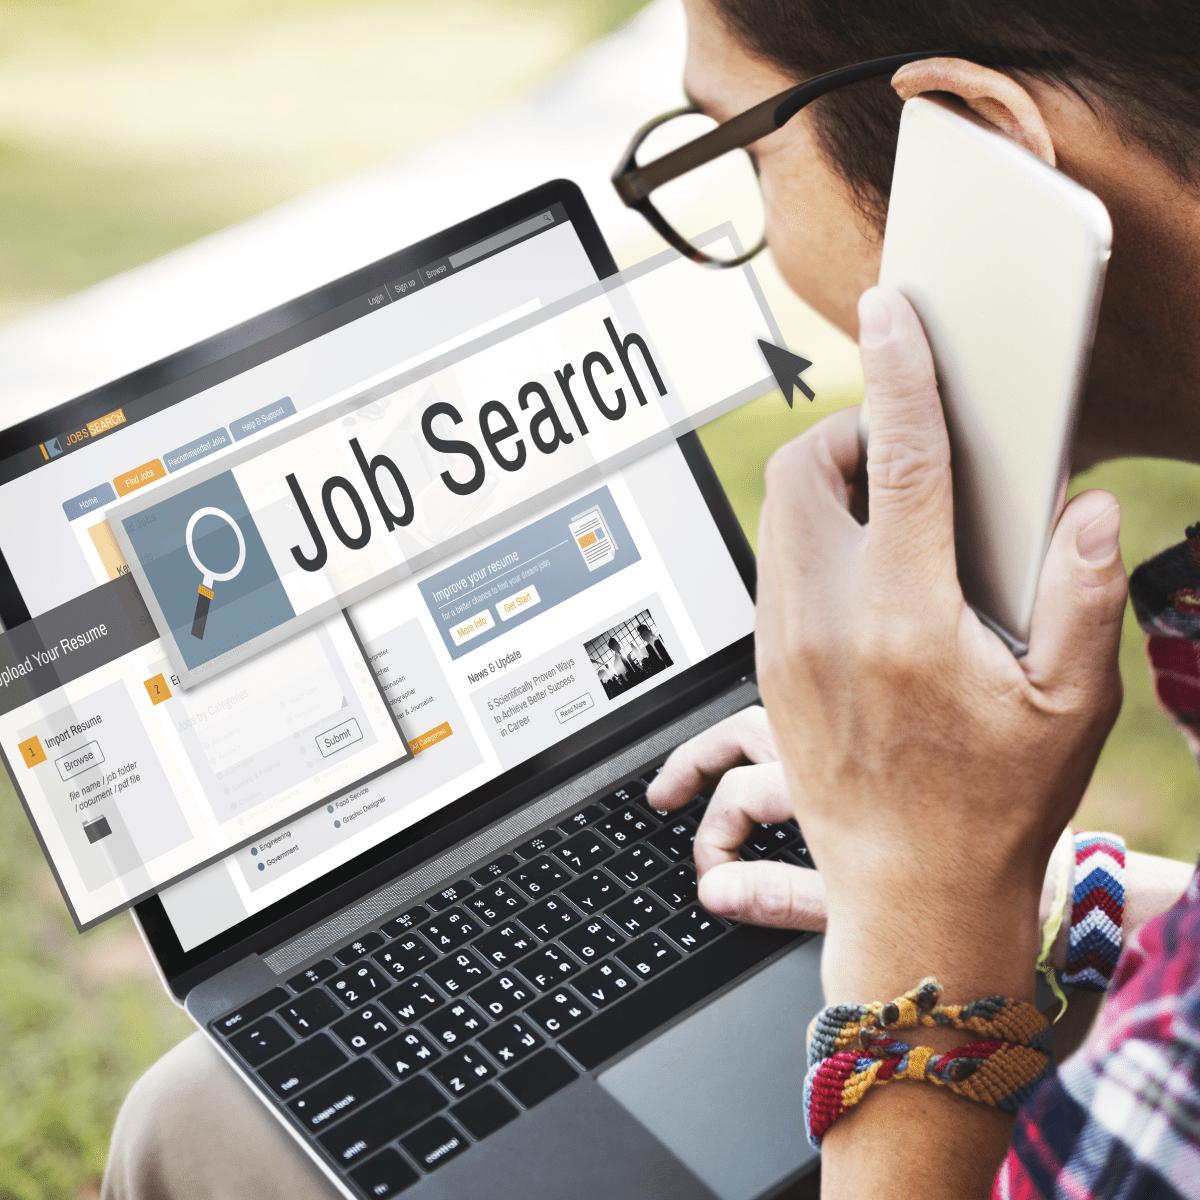 Job searching via the internet